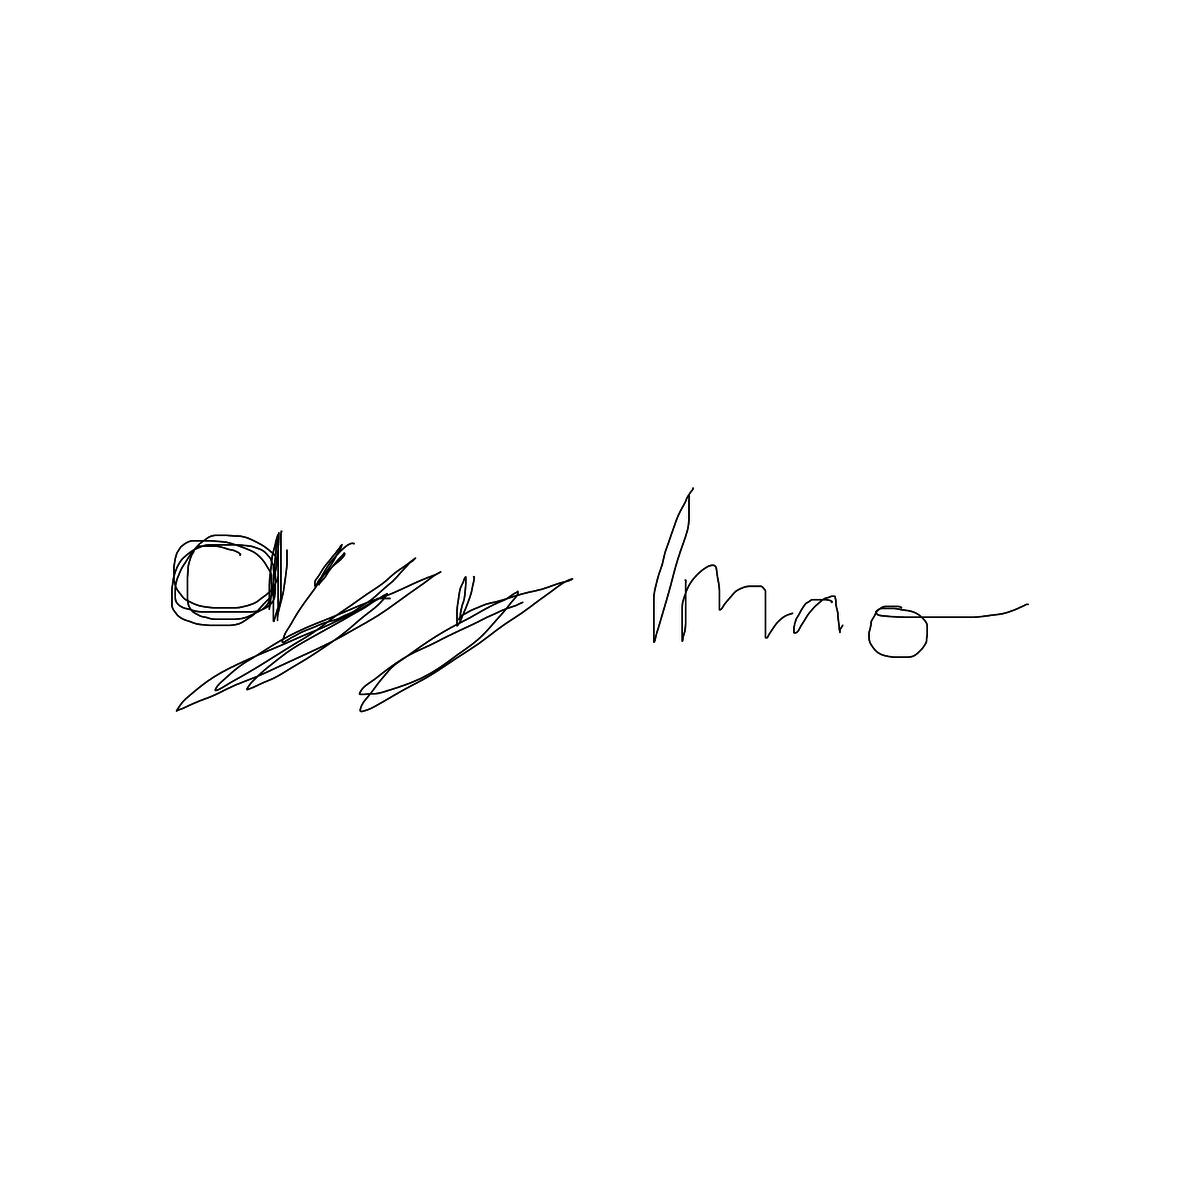 BAAAM drawing#7887 lat:49.6179656982421900lng: 6.1353921890258790